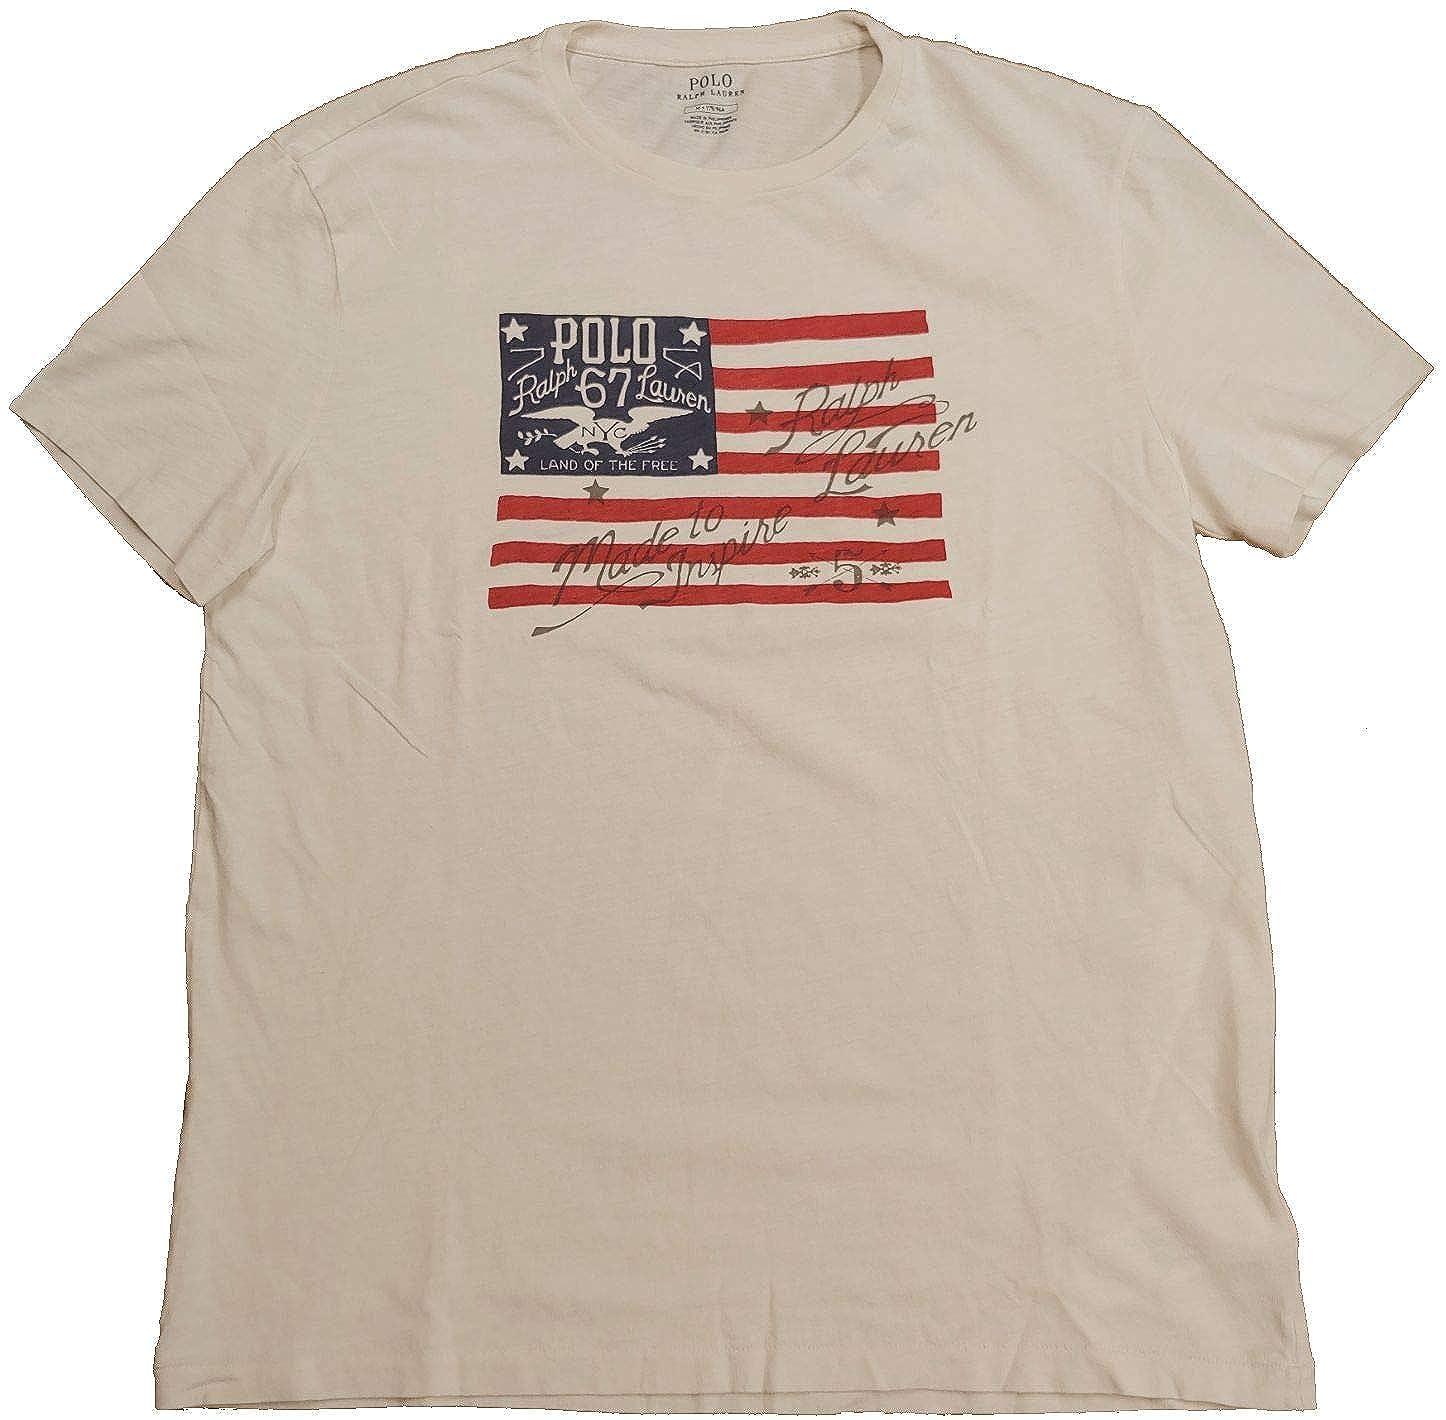 1919b1a8 Polo Ralph Lauren Mens Graphic Short Sleeve Graphic T-Shirt | Amazon.com